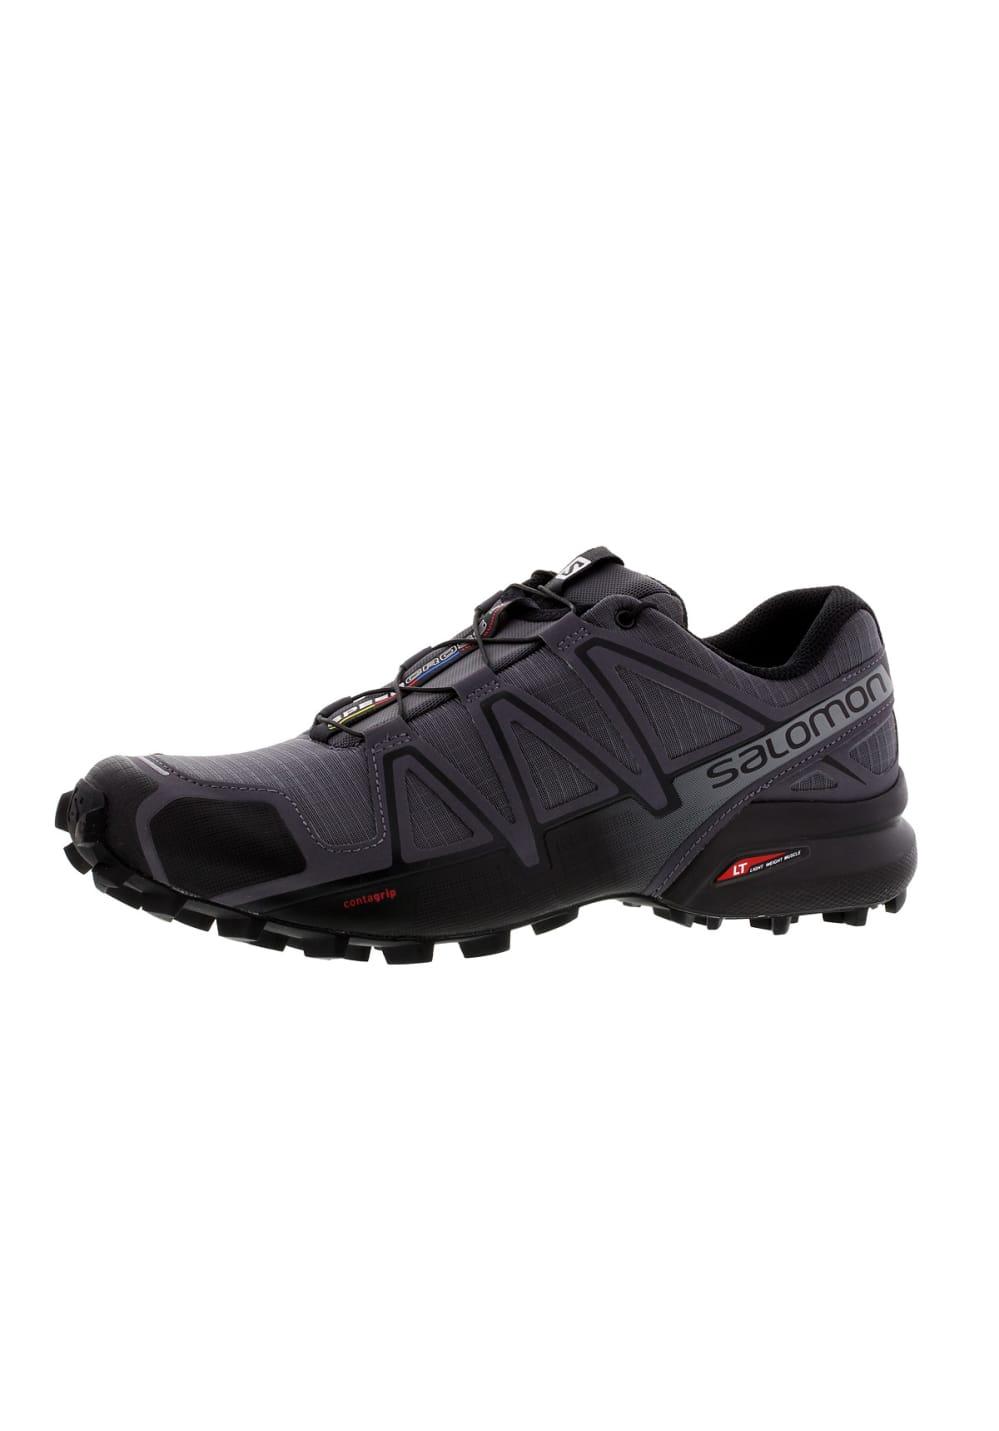 premium selection 600a5 bdf56 Salomon Speedcross 4 - Running shoes for Men - Grey   21RUN